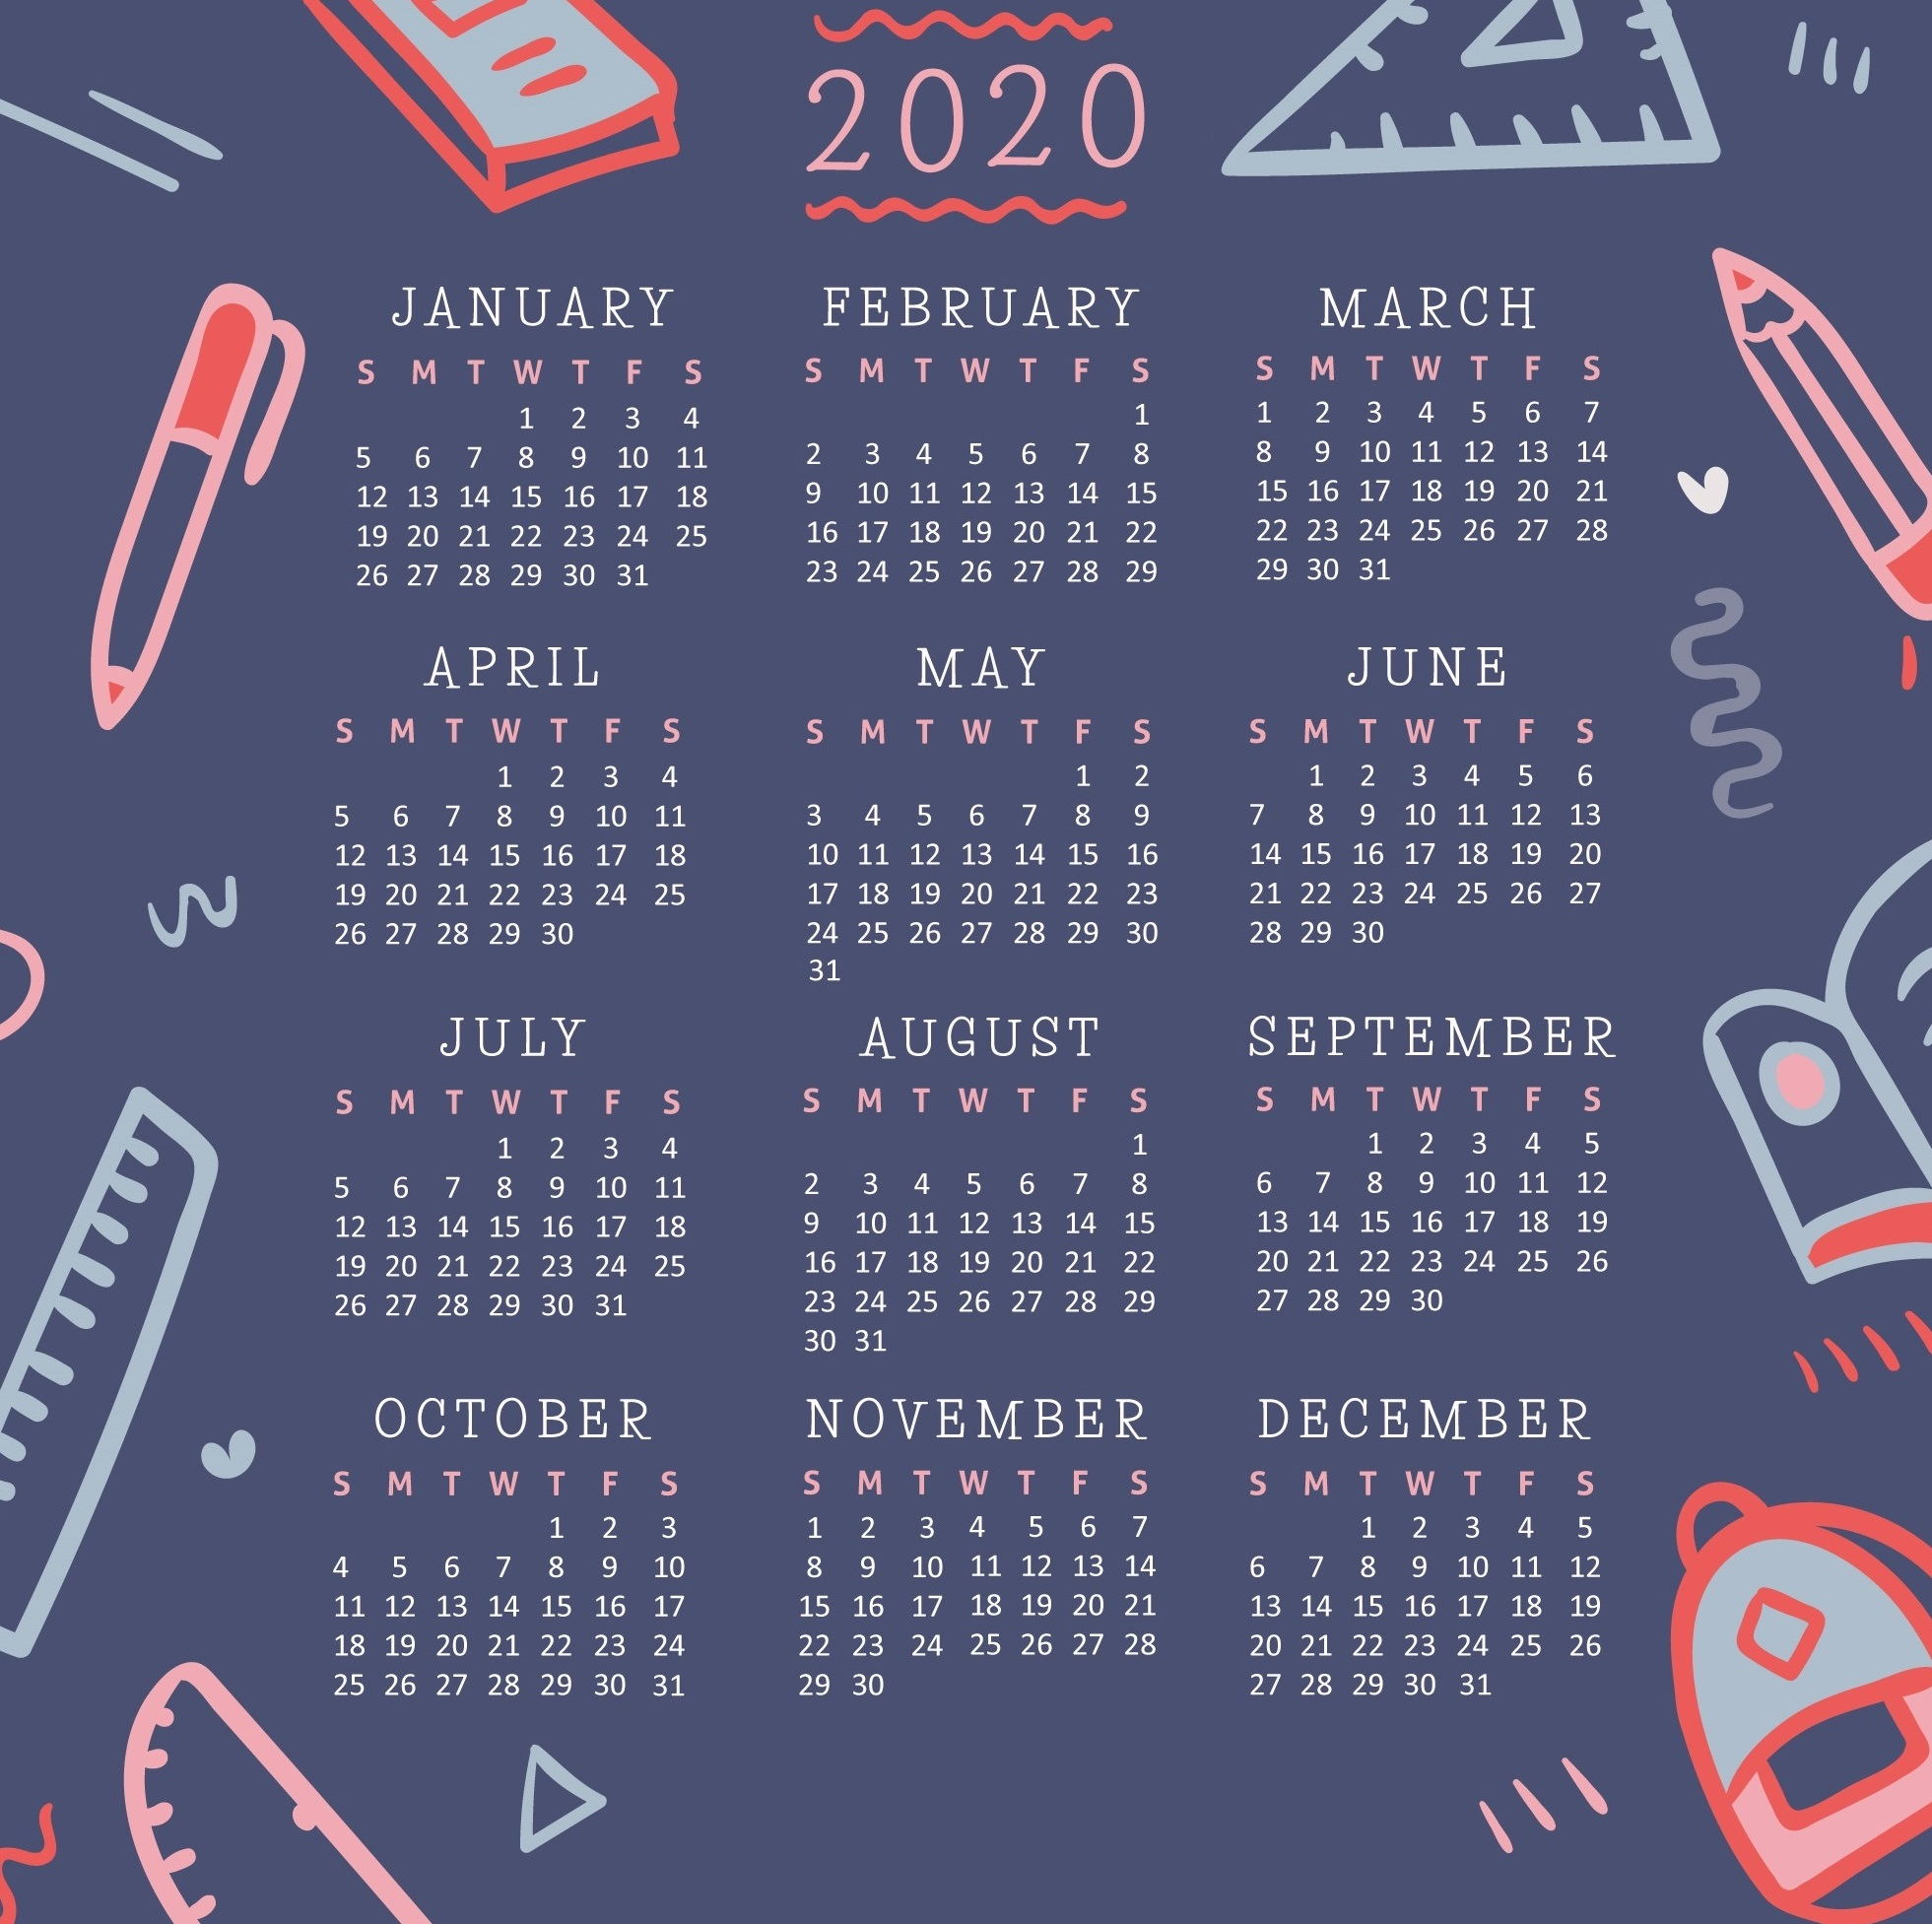 53] Calendar 2020 Wallpapers on WallpaperSafari 1961x1953